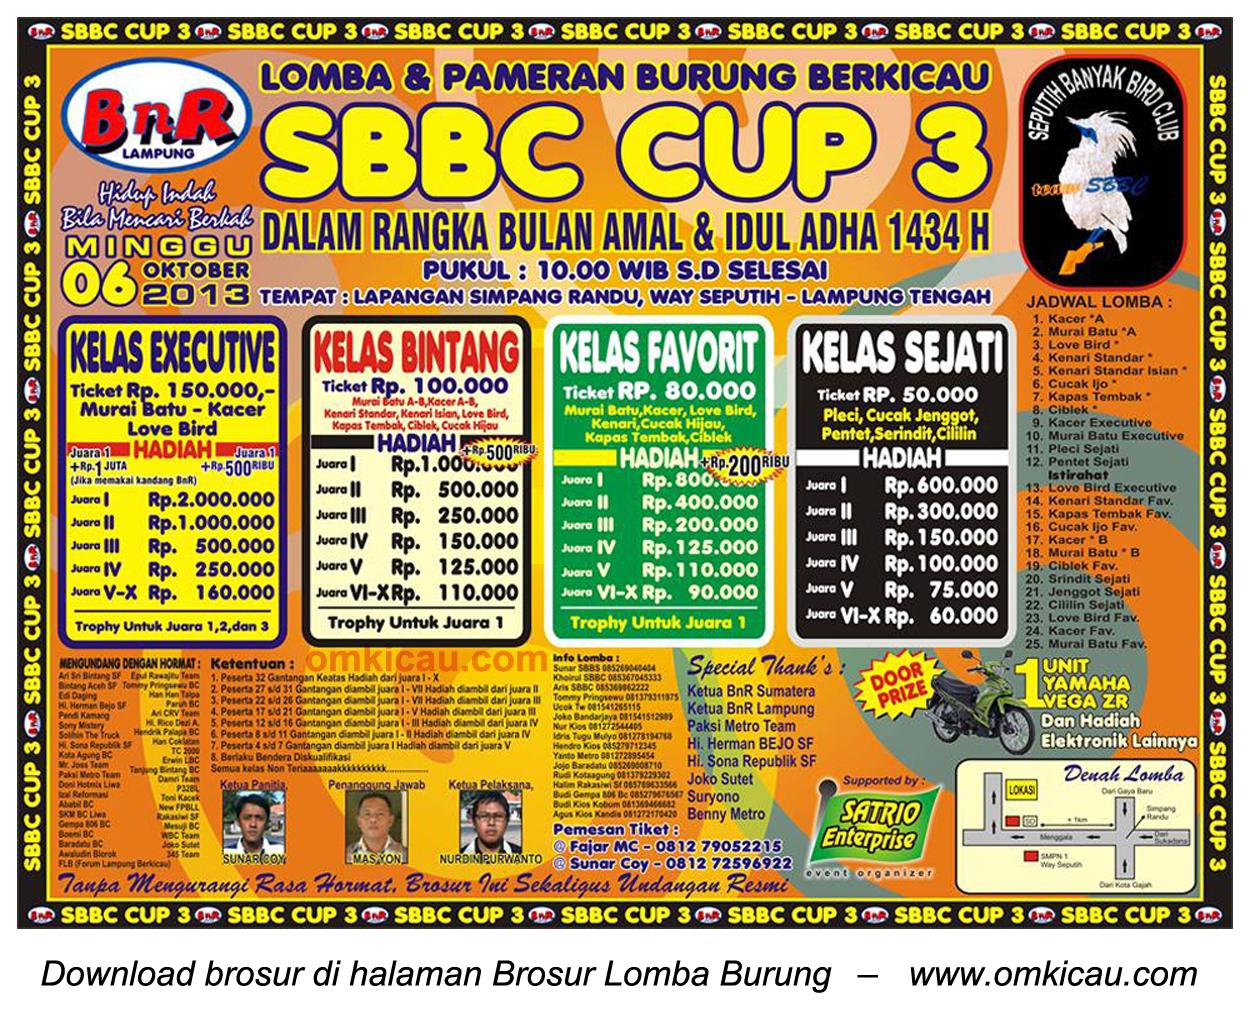 Brosur Lomba Burung Berkicau SBBC Cup 3, Lampung Tengah, 6 Oktober 2013